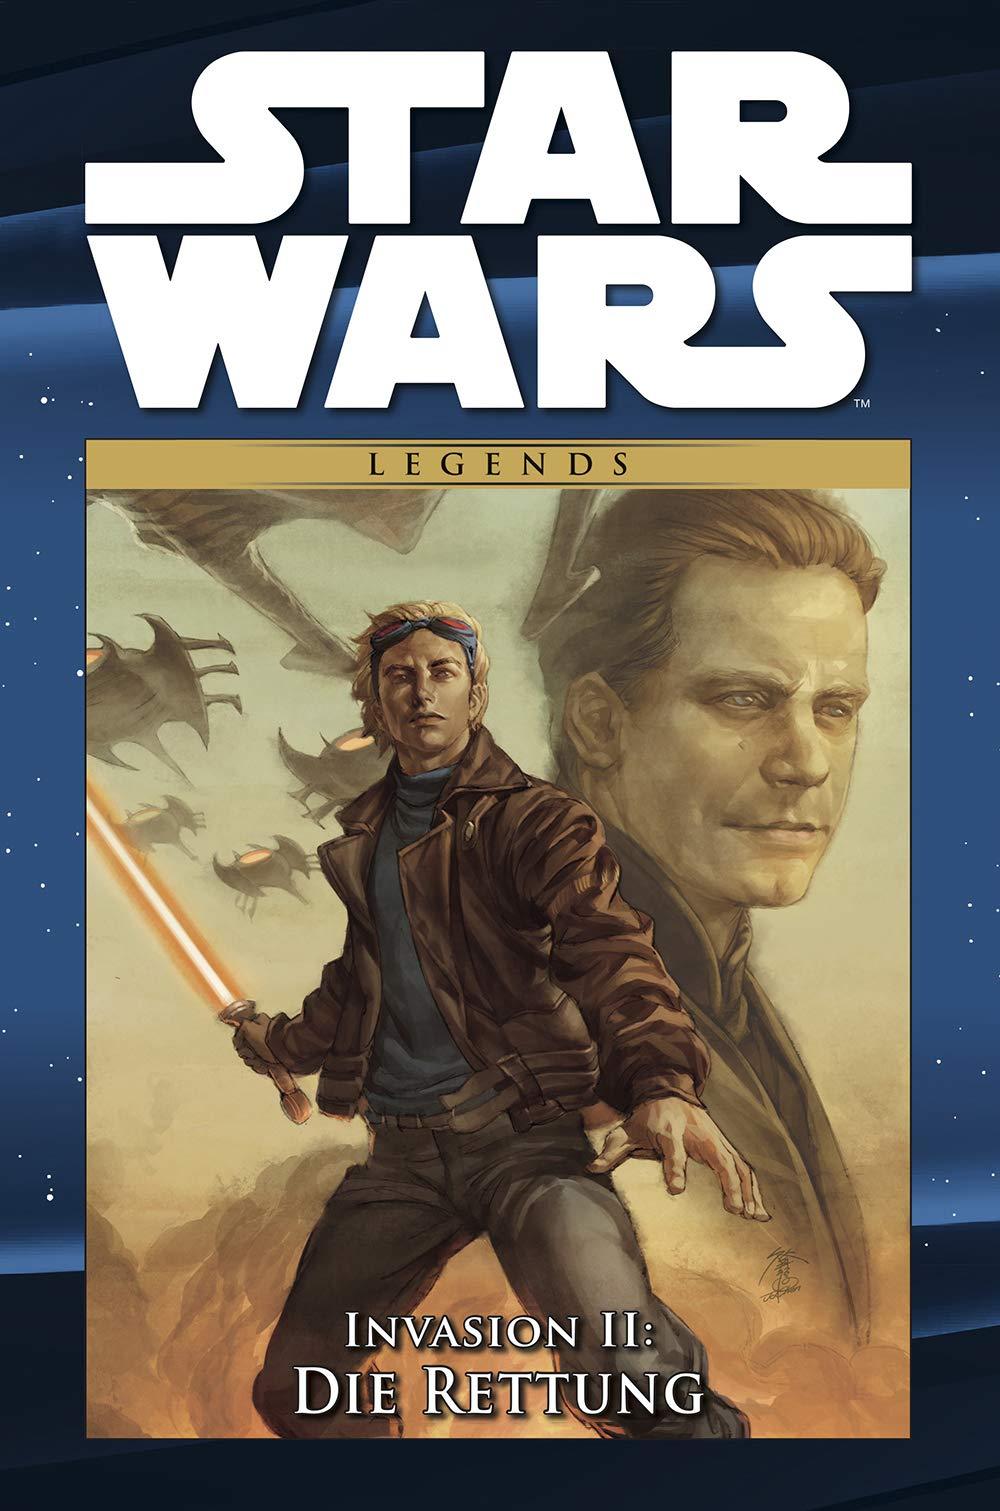 Star Wars Comic-Kollektion, Band 89: Invasion II: Die Rettung (21.01.2020)